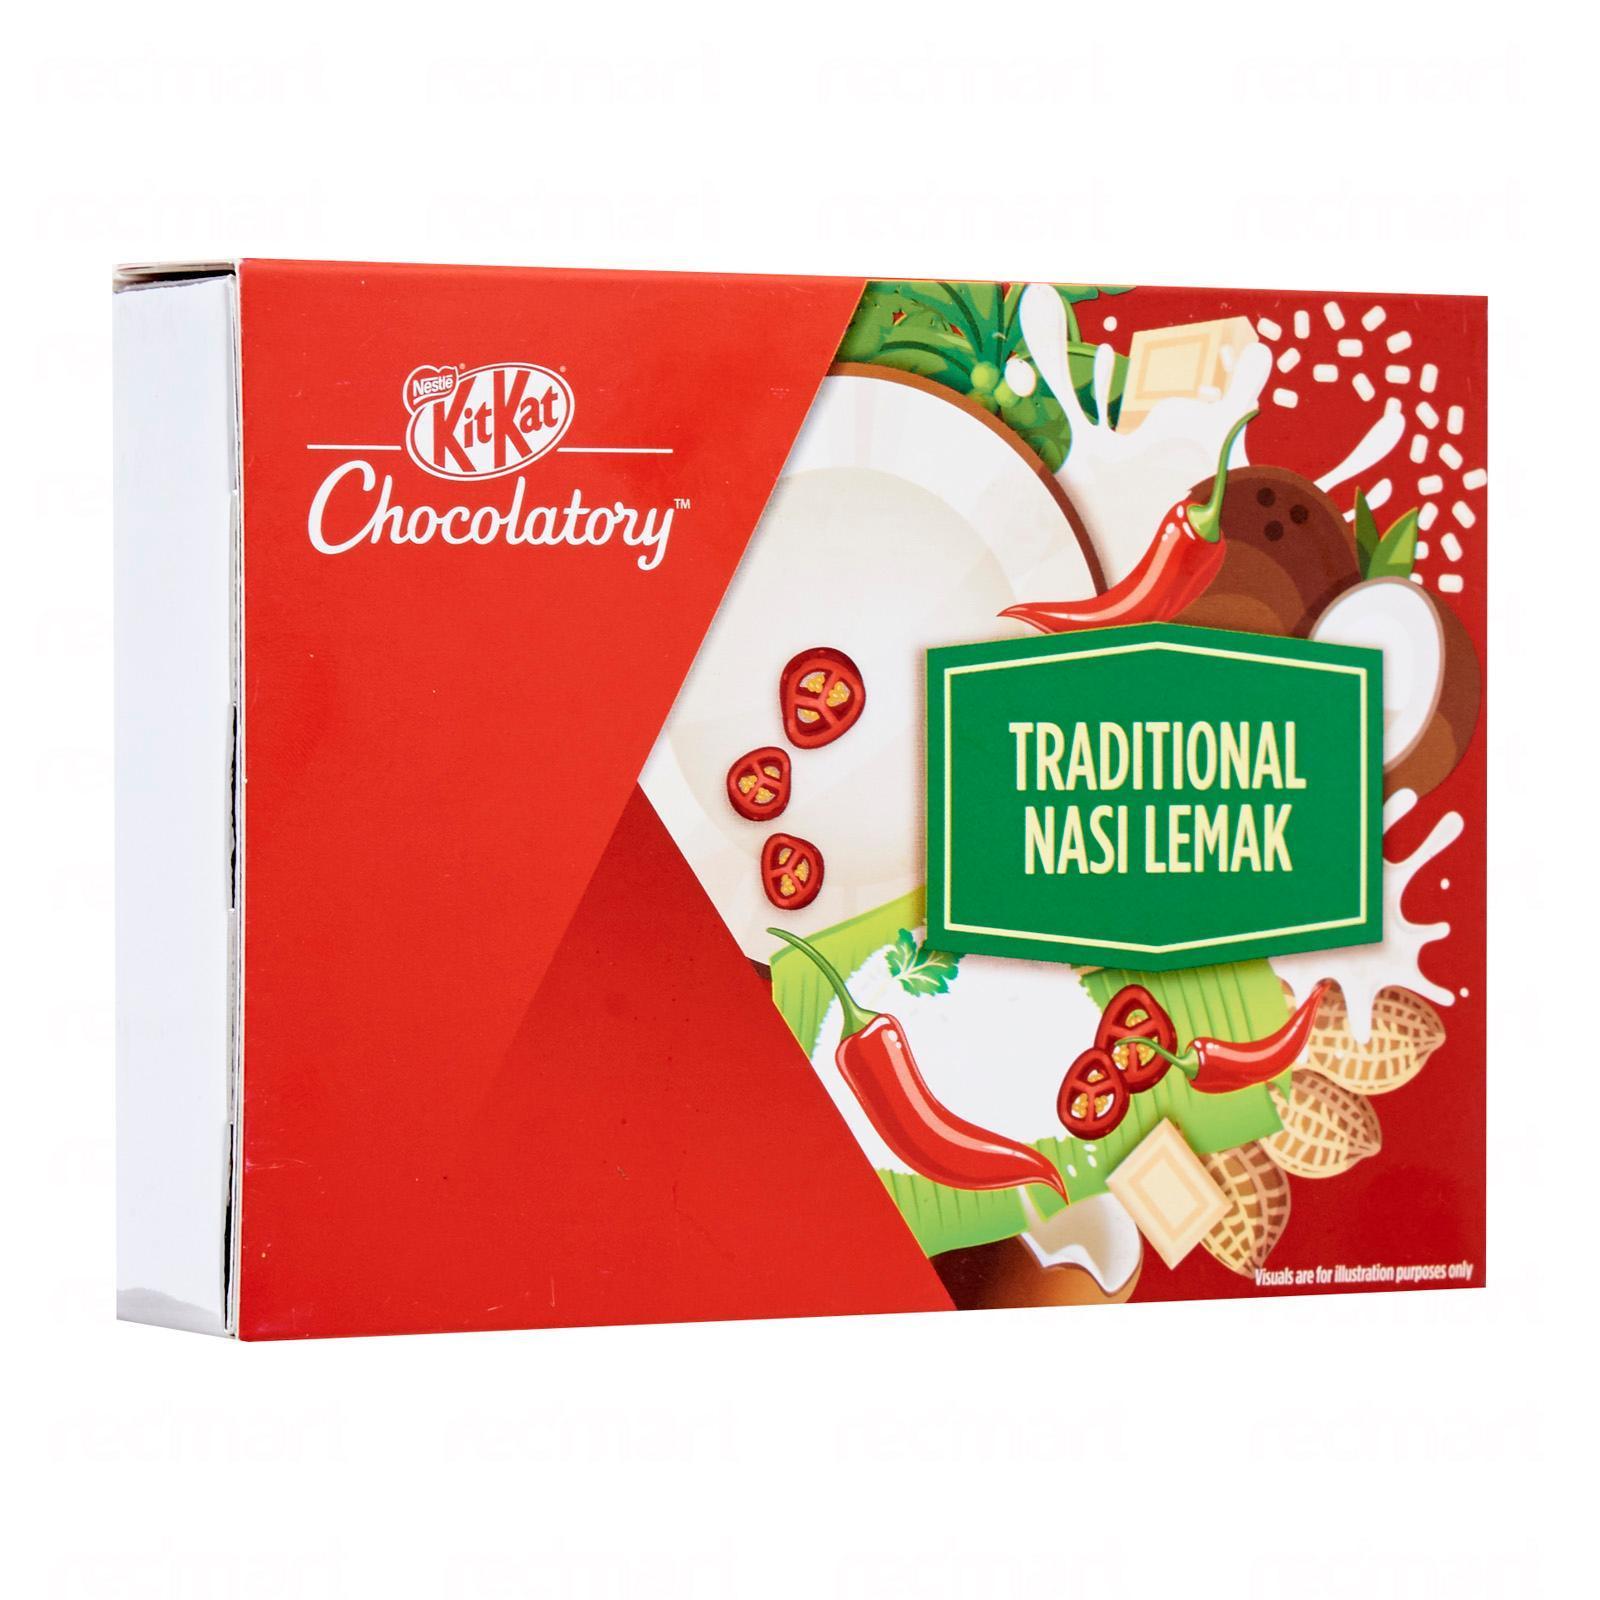 NESTLE KIT KAT Chocolatory Traditional Nasi Lemak (Special Edition)